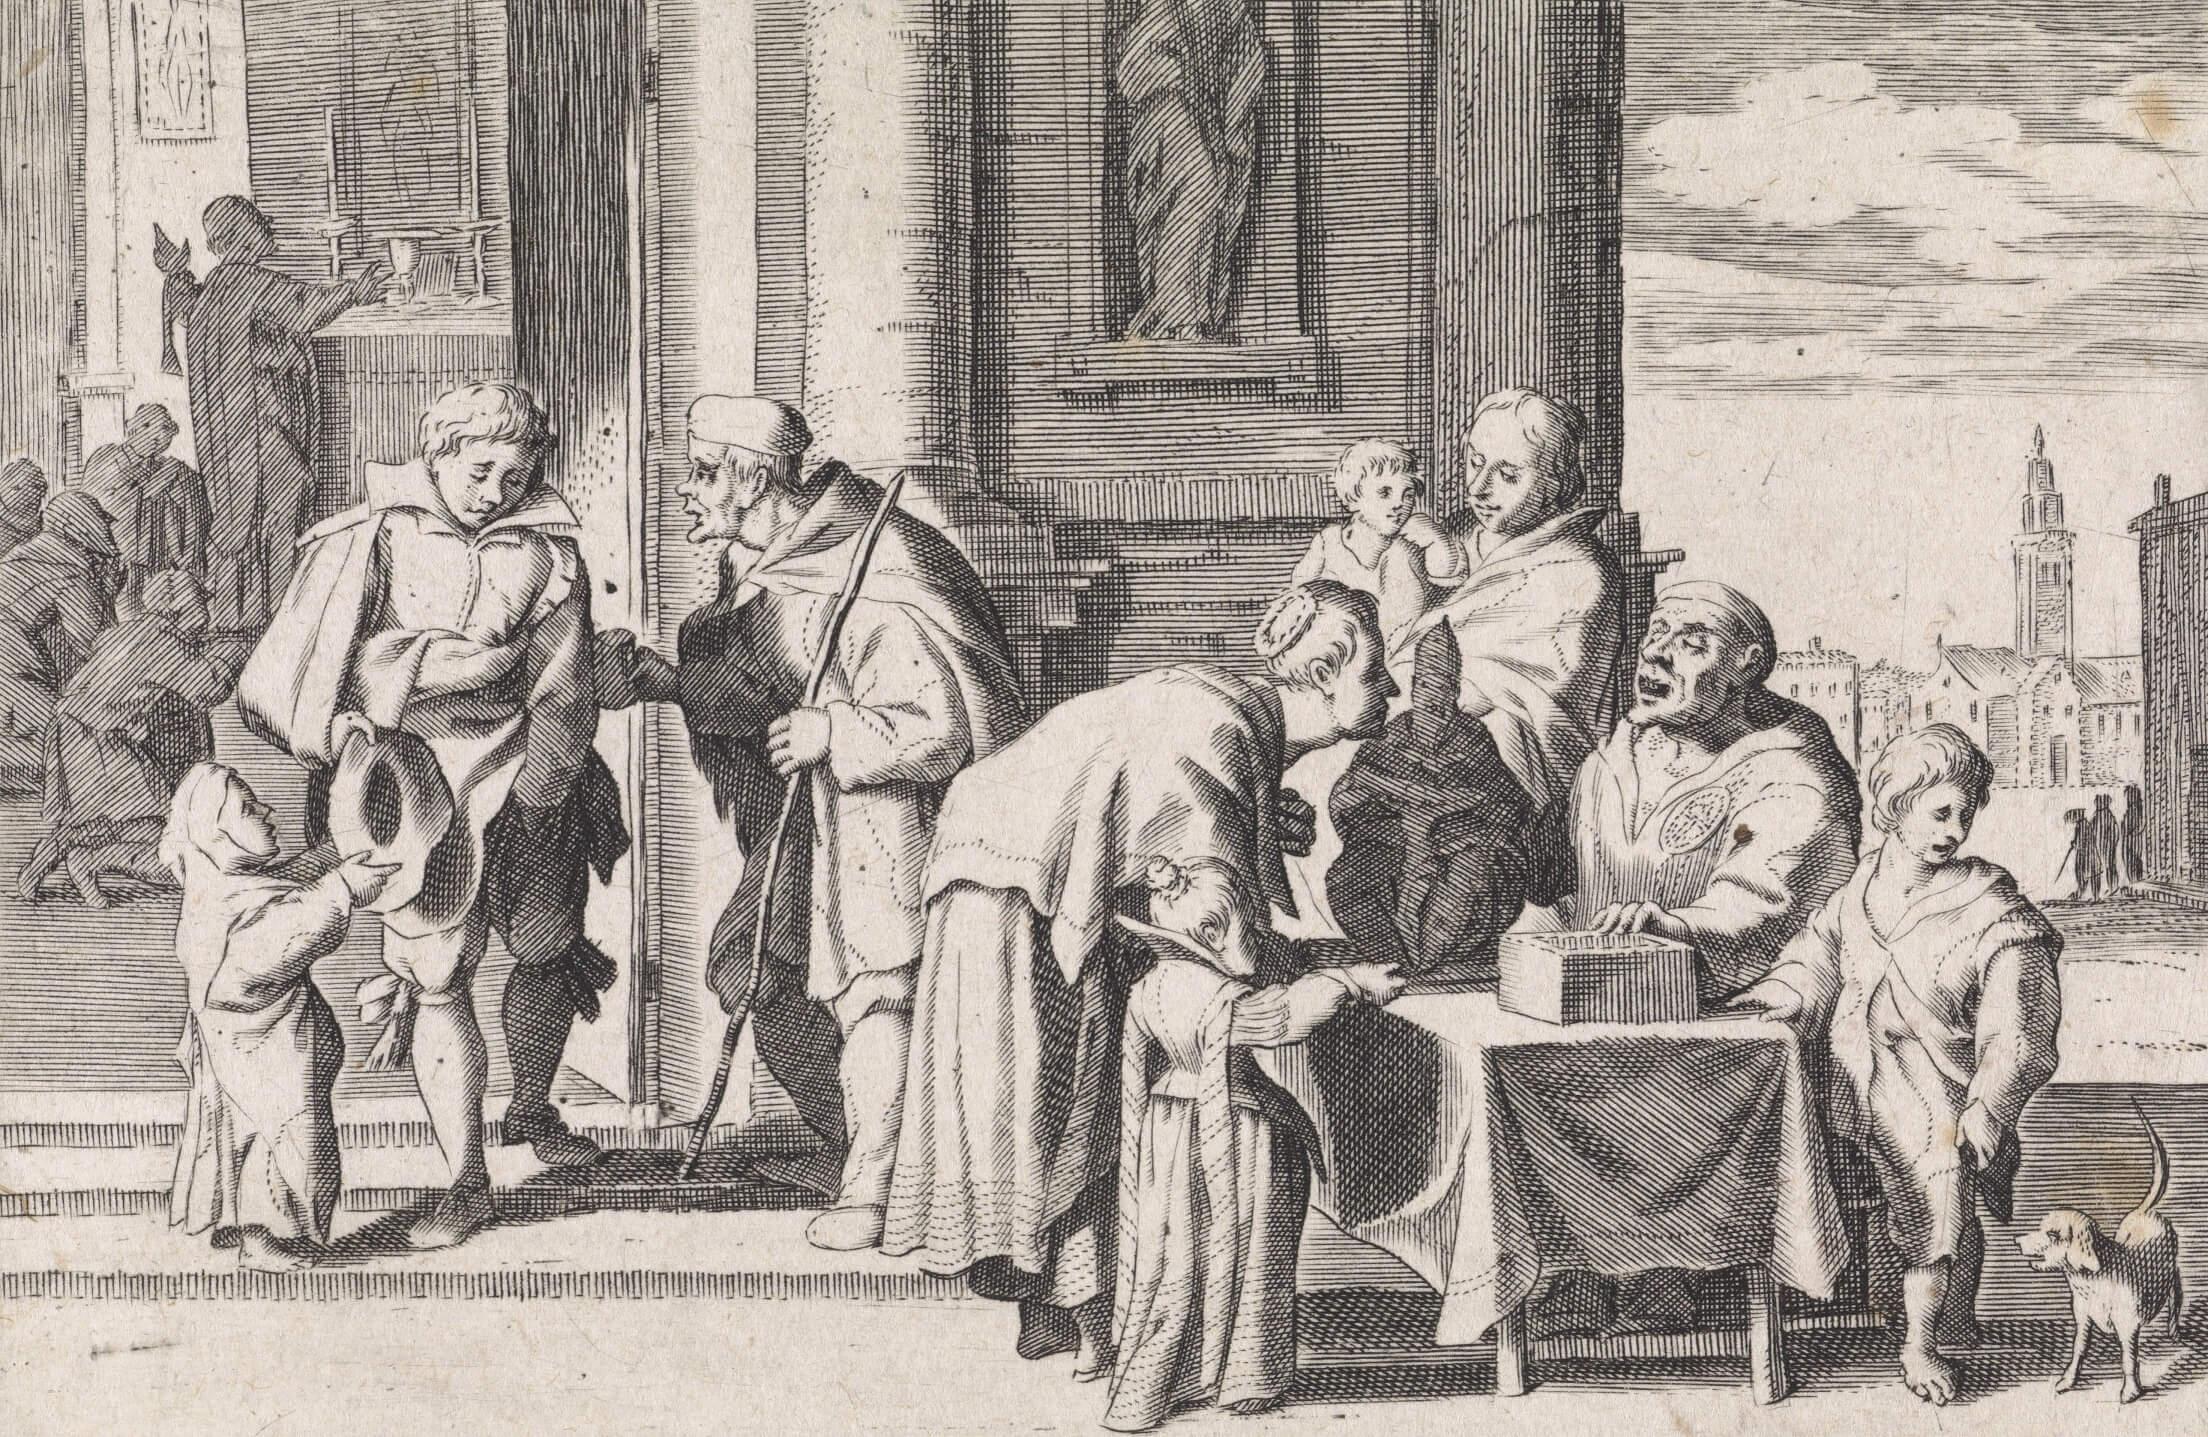 Parish, Power & Politics